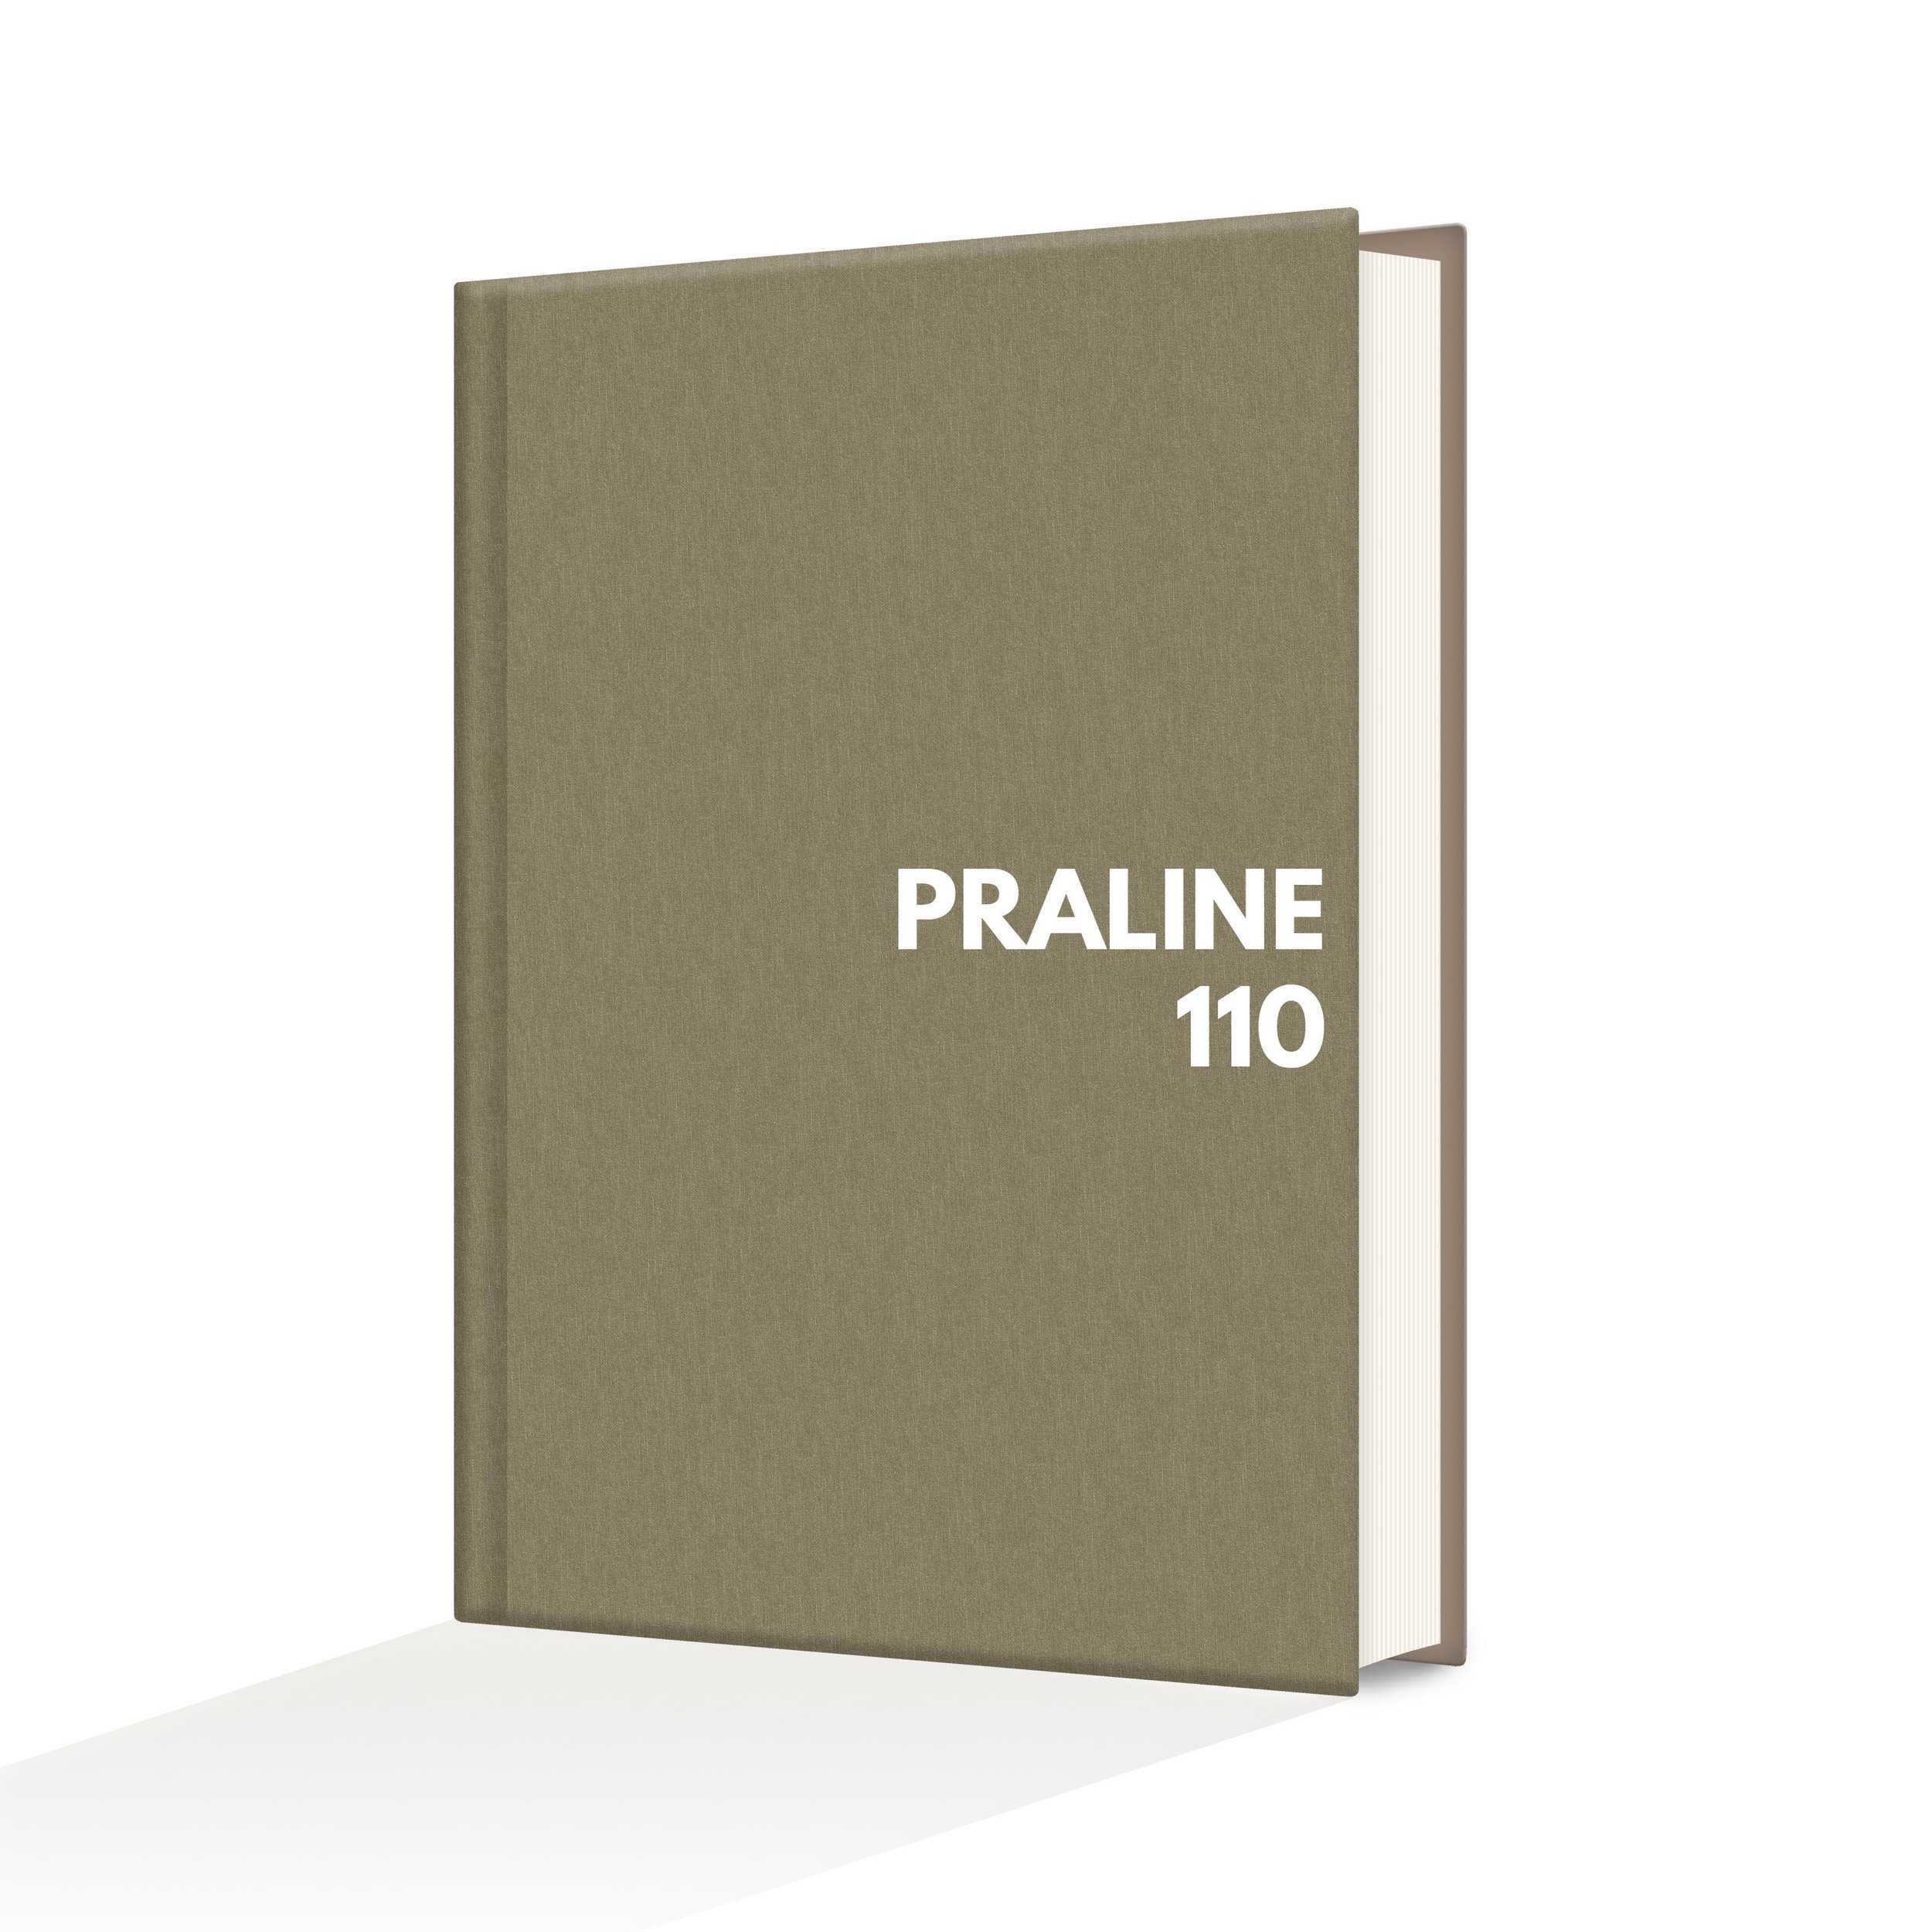 pralinel110.jpg